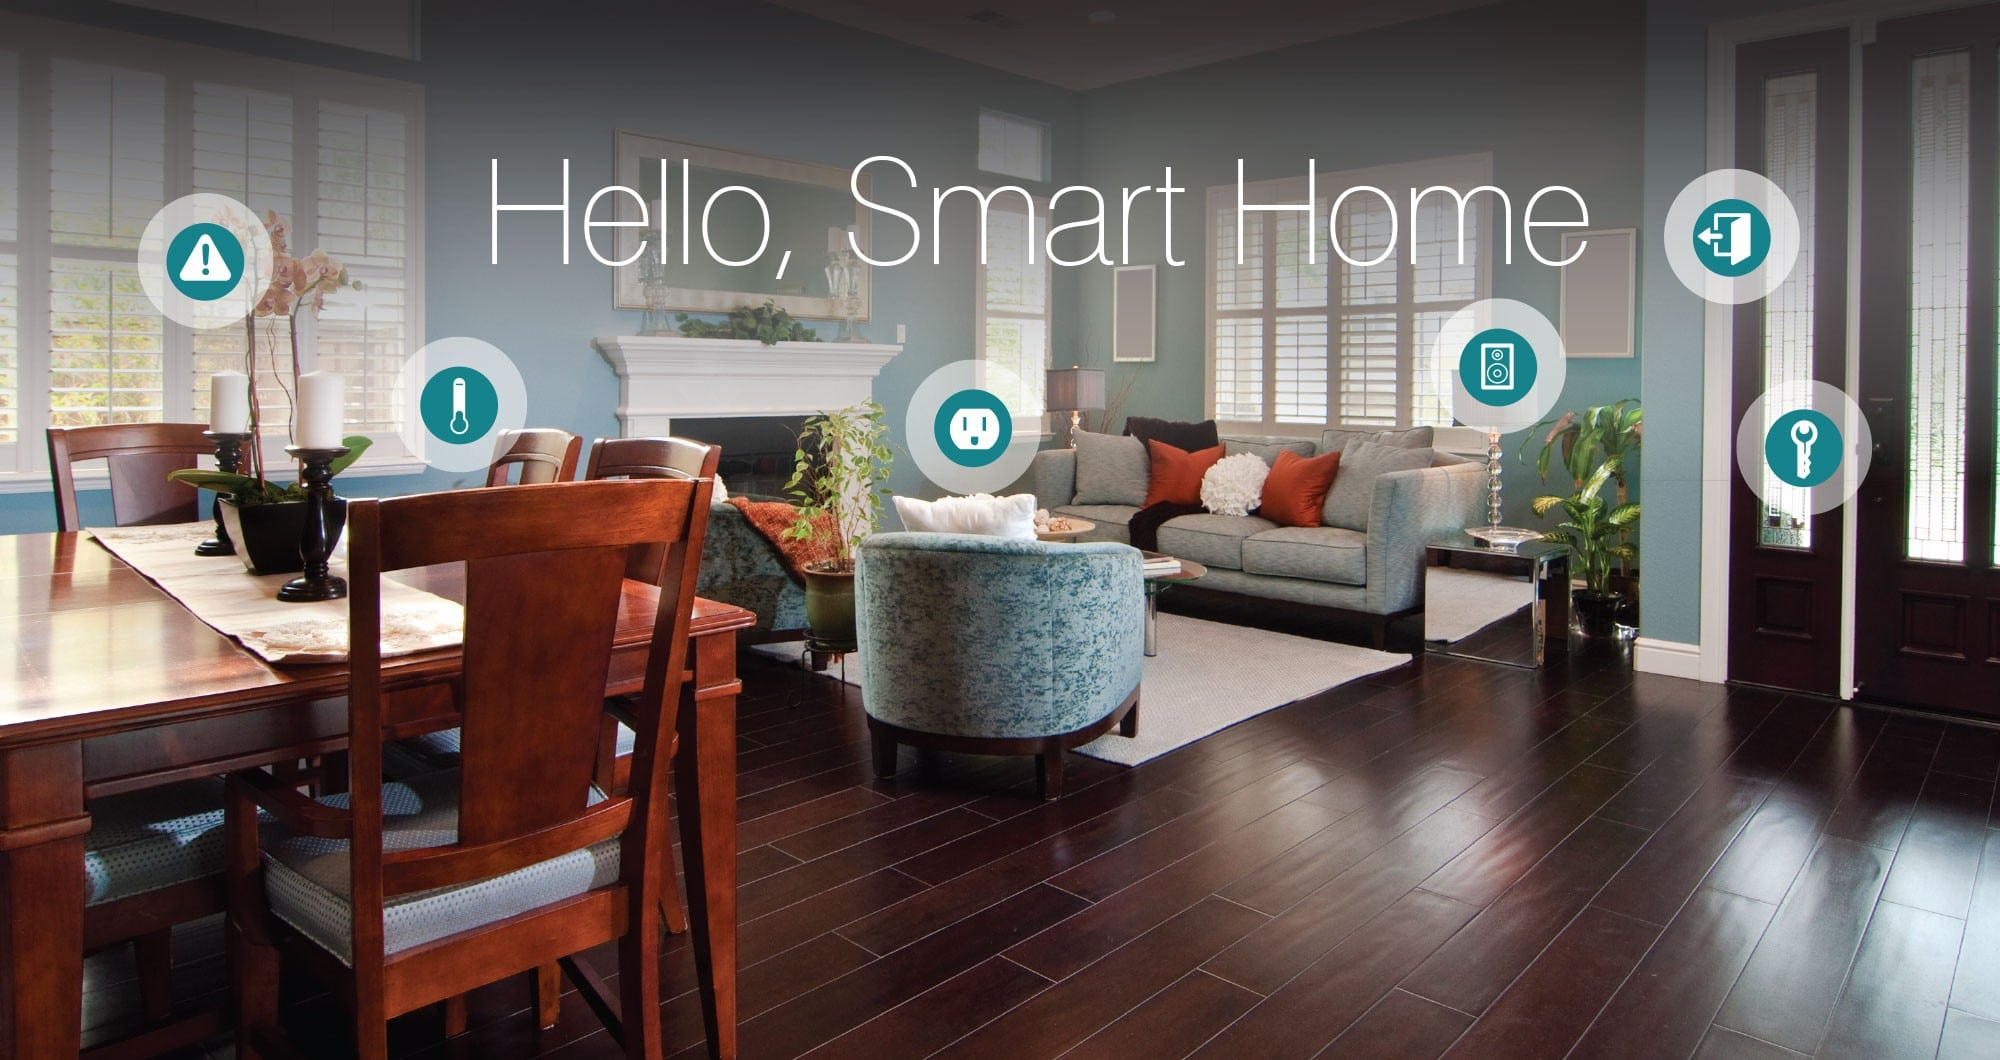 hello smart home